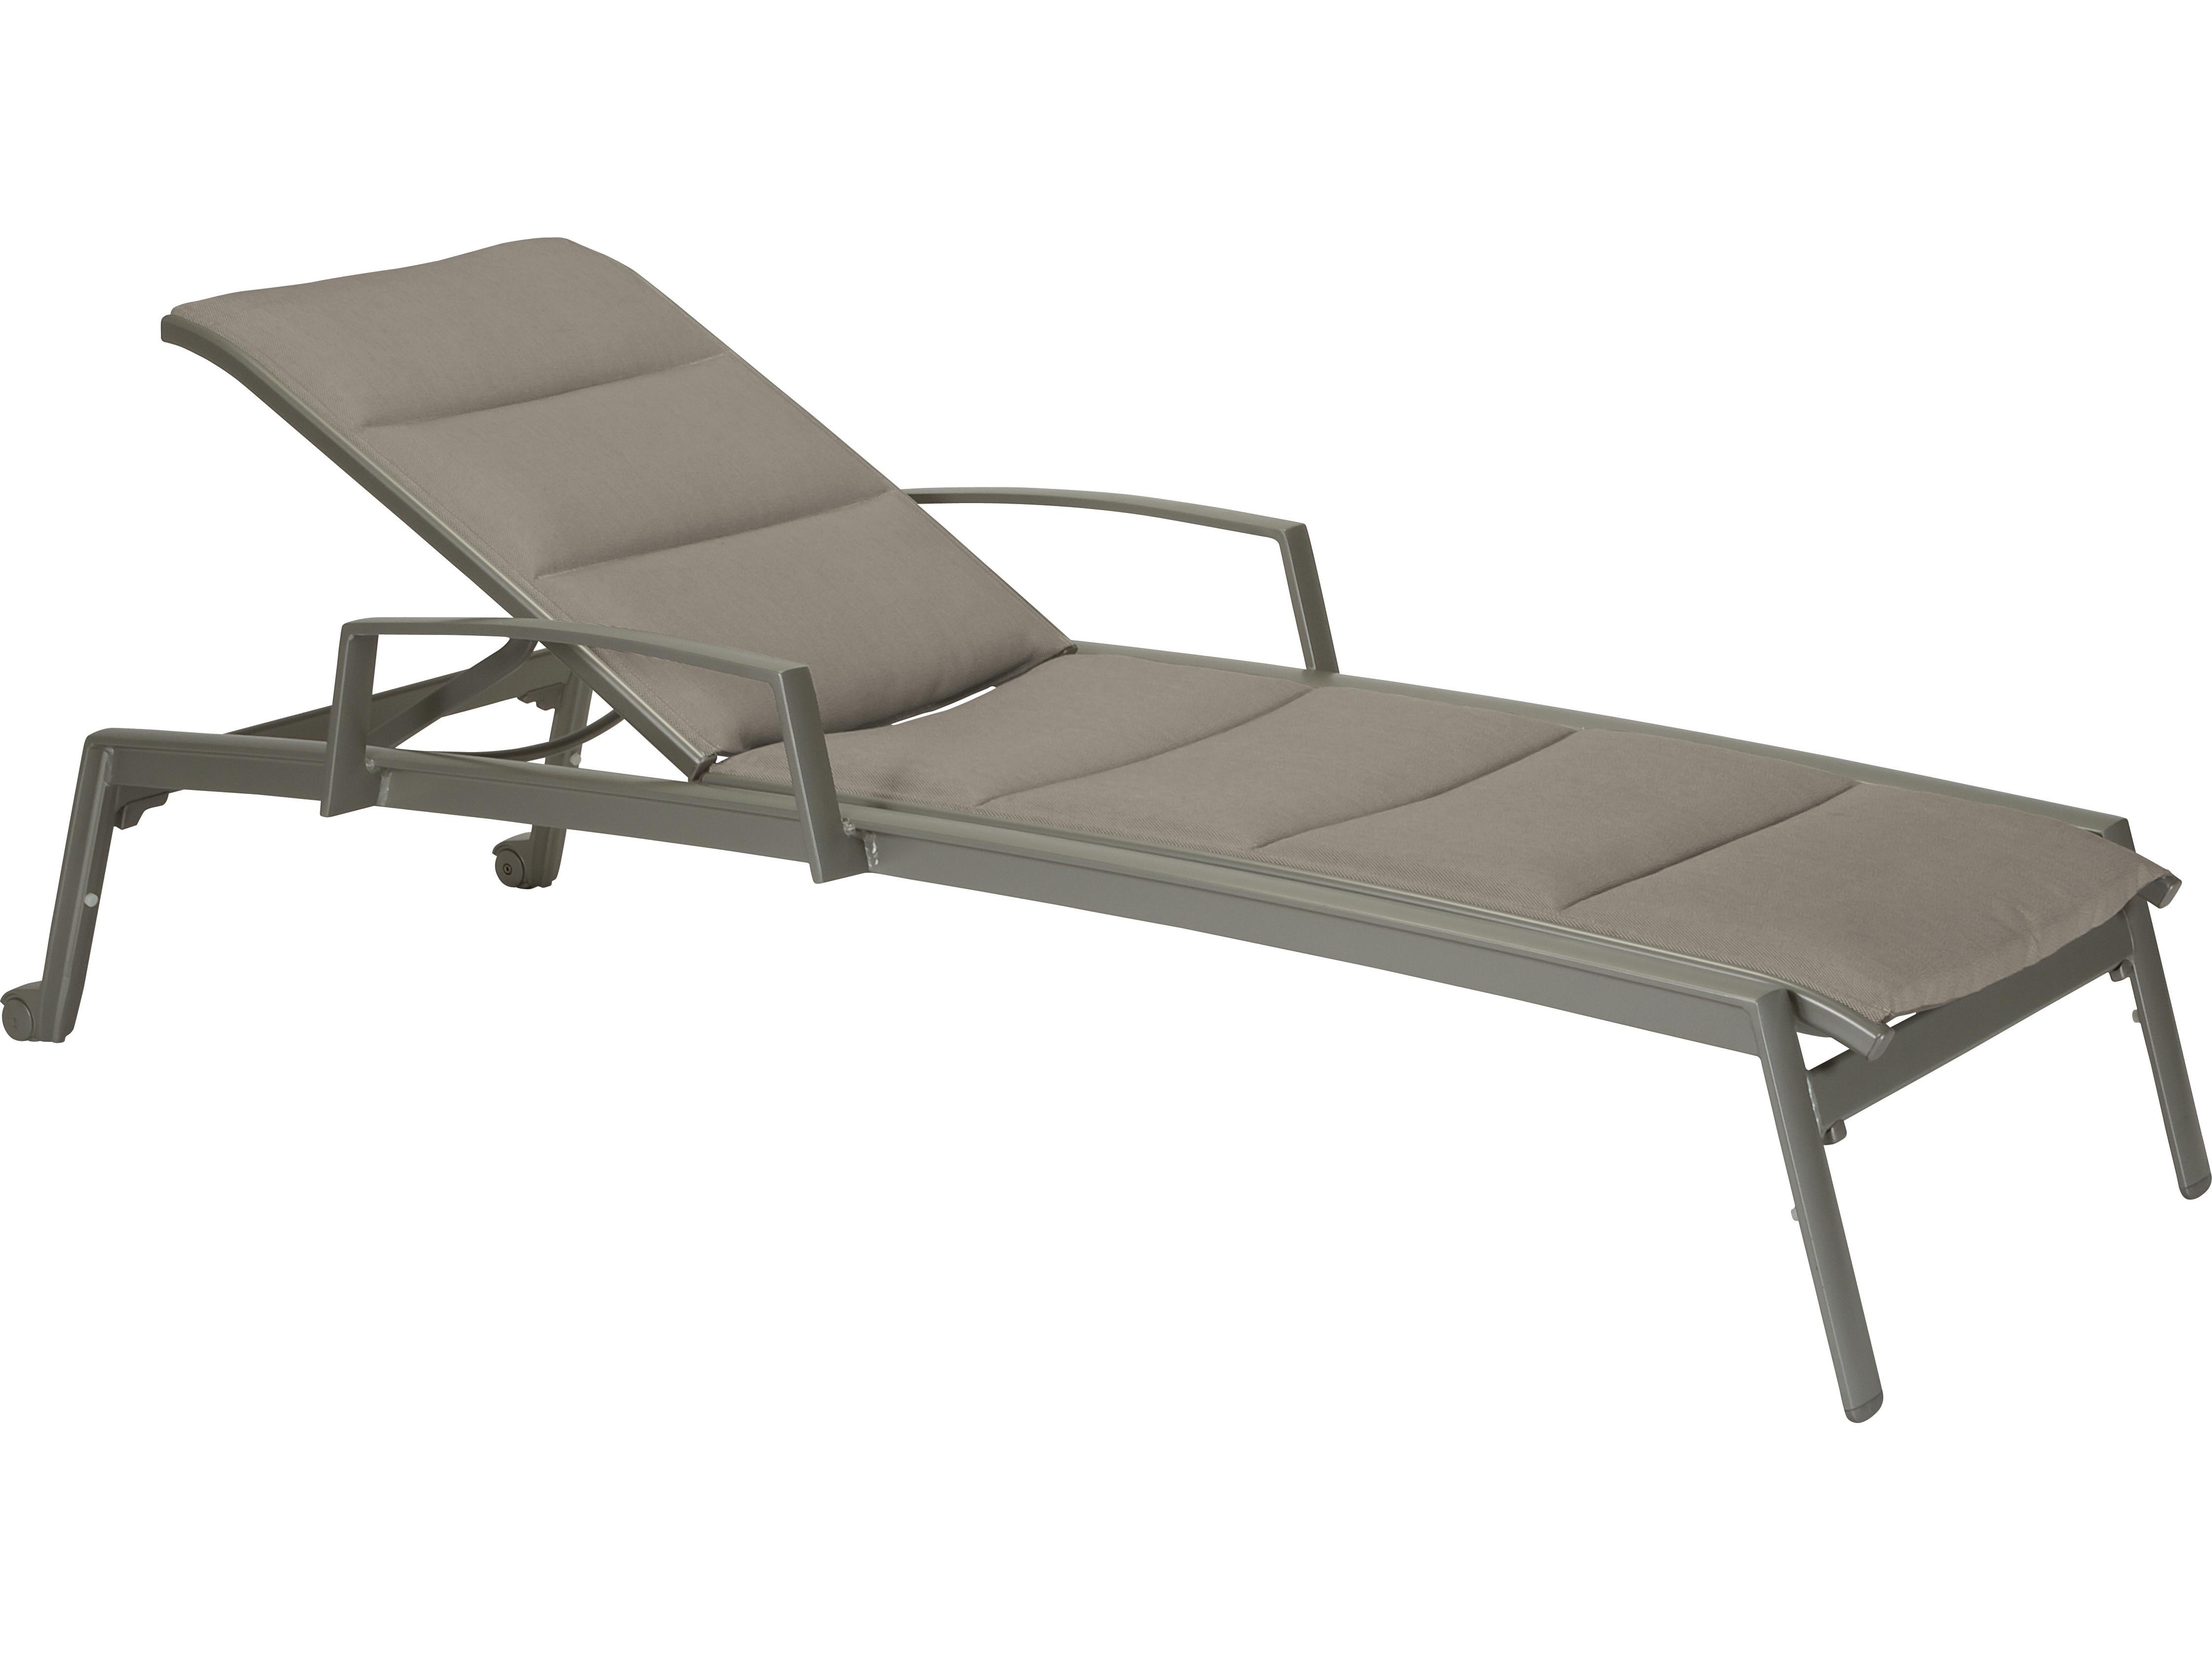 Tropitone Elance Padded Sling Aluminum Chaise Lounge with ...